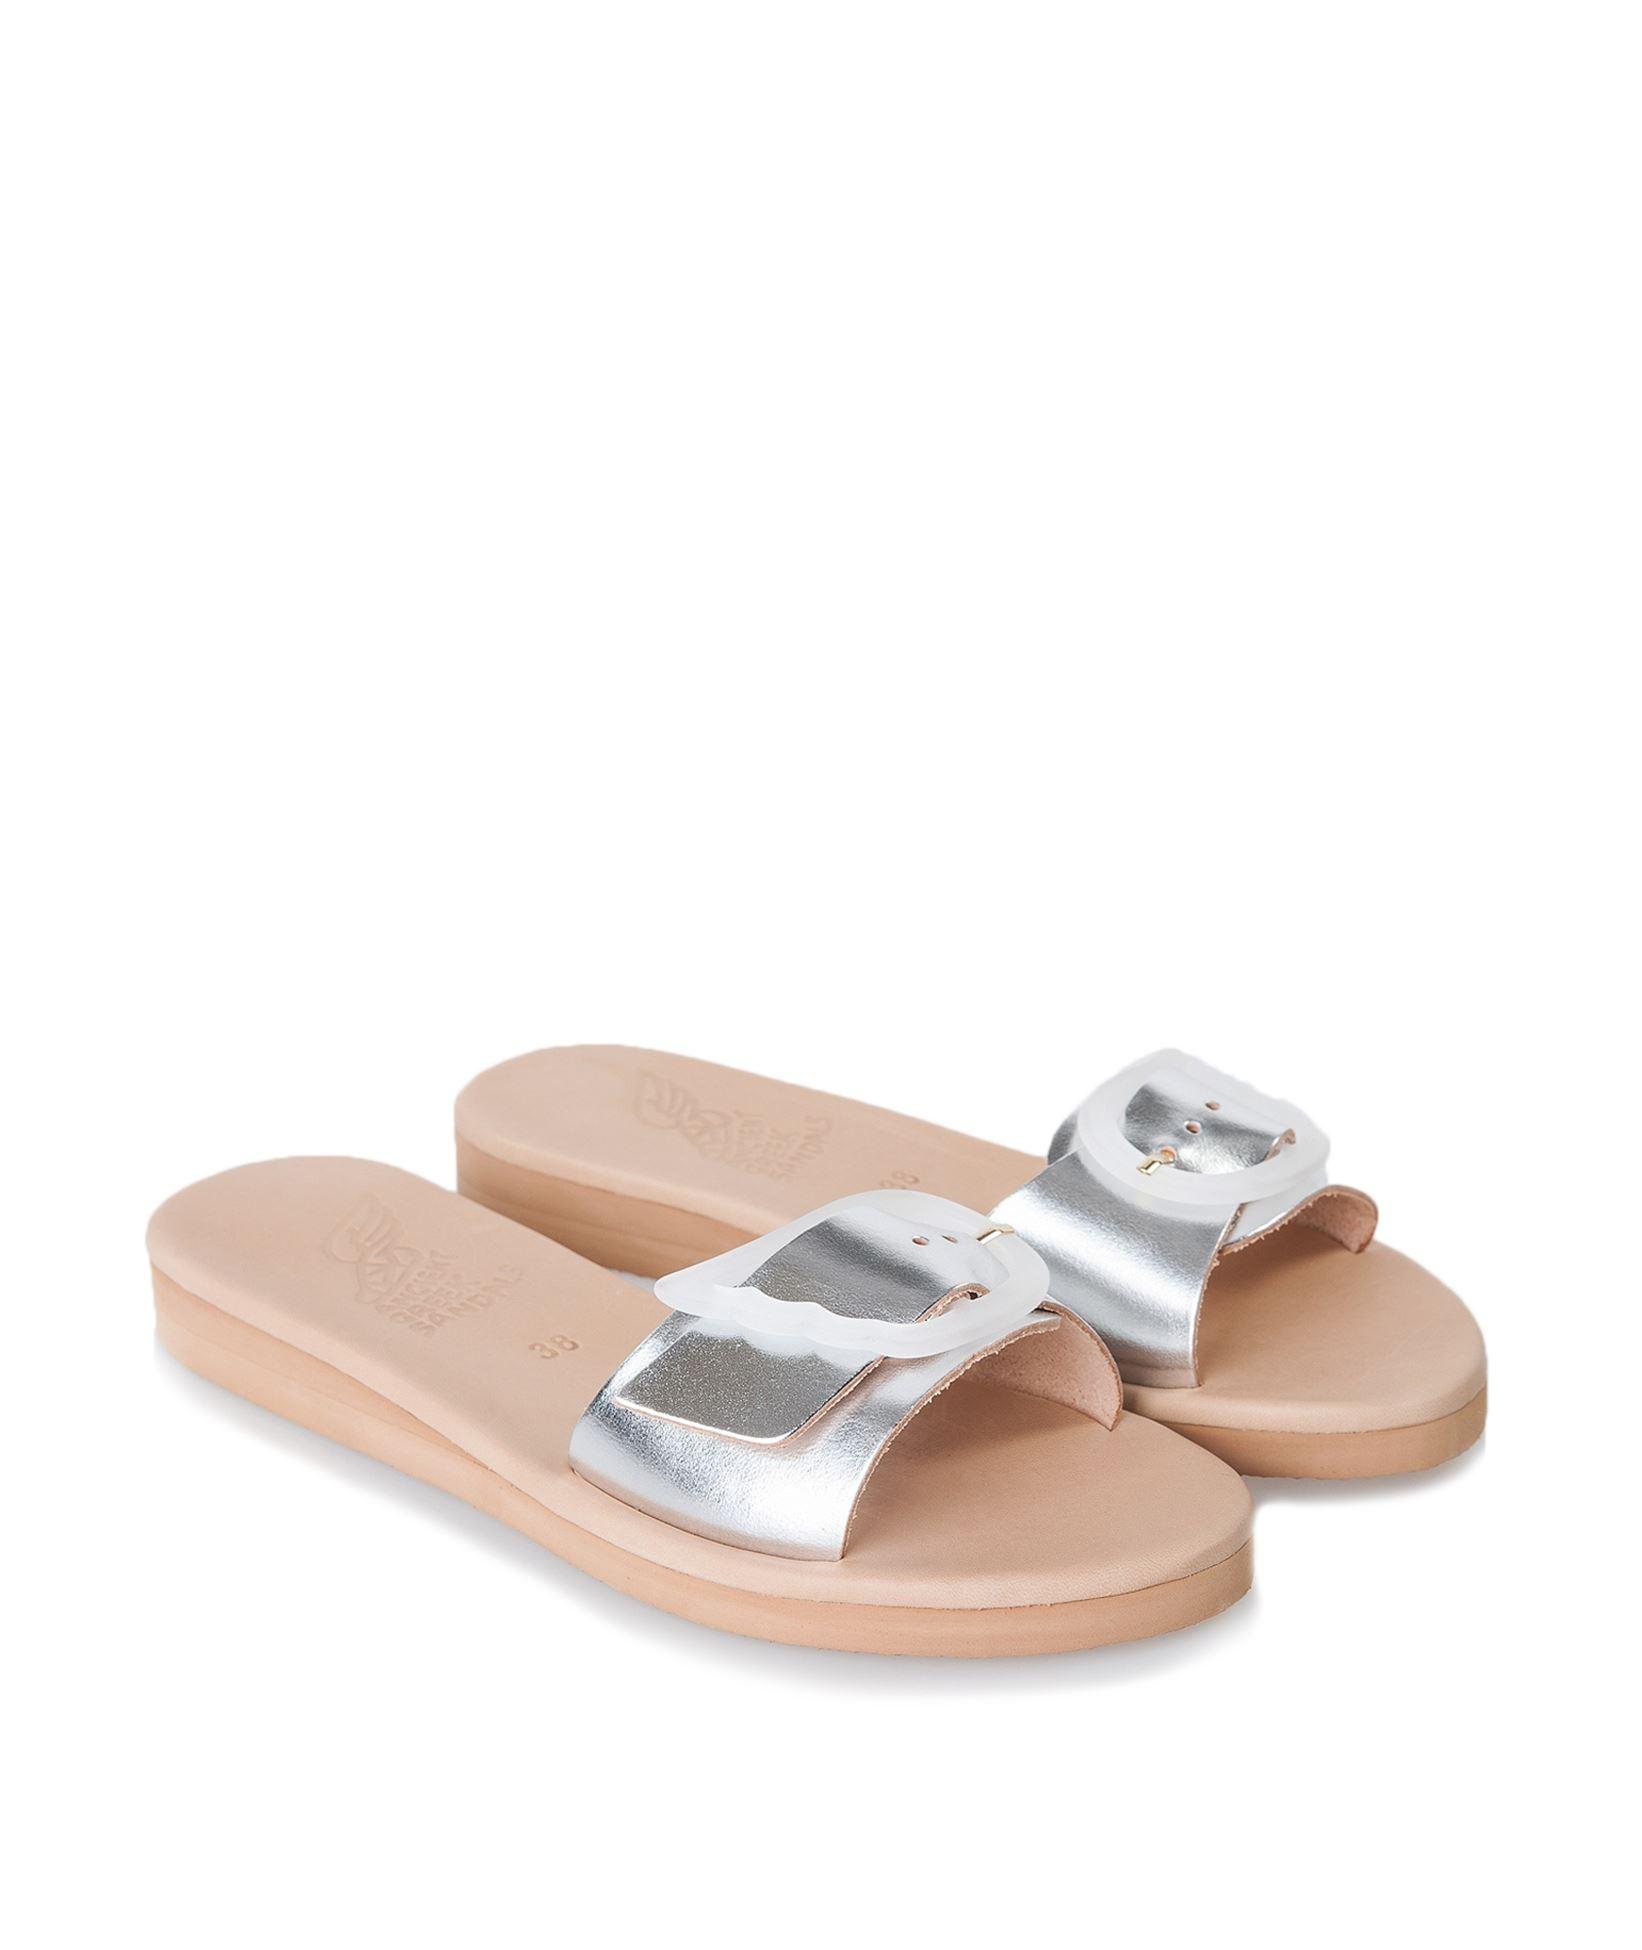 72f5d9bde Ancient Greek Sandals Silver Aglaia Sandals   Everyday Essentials ...